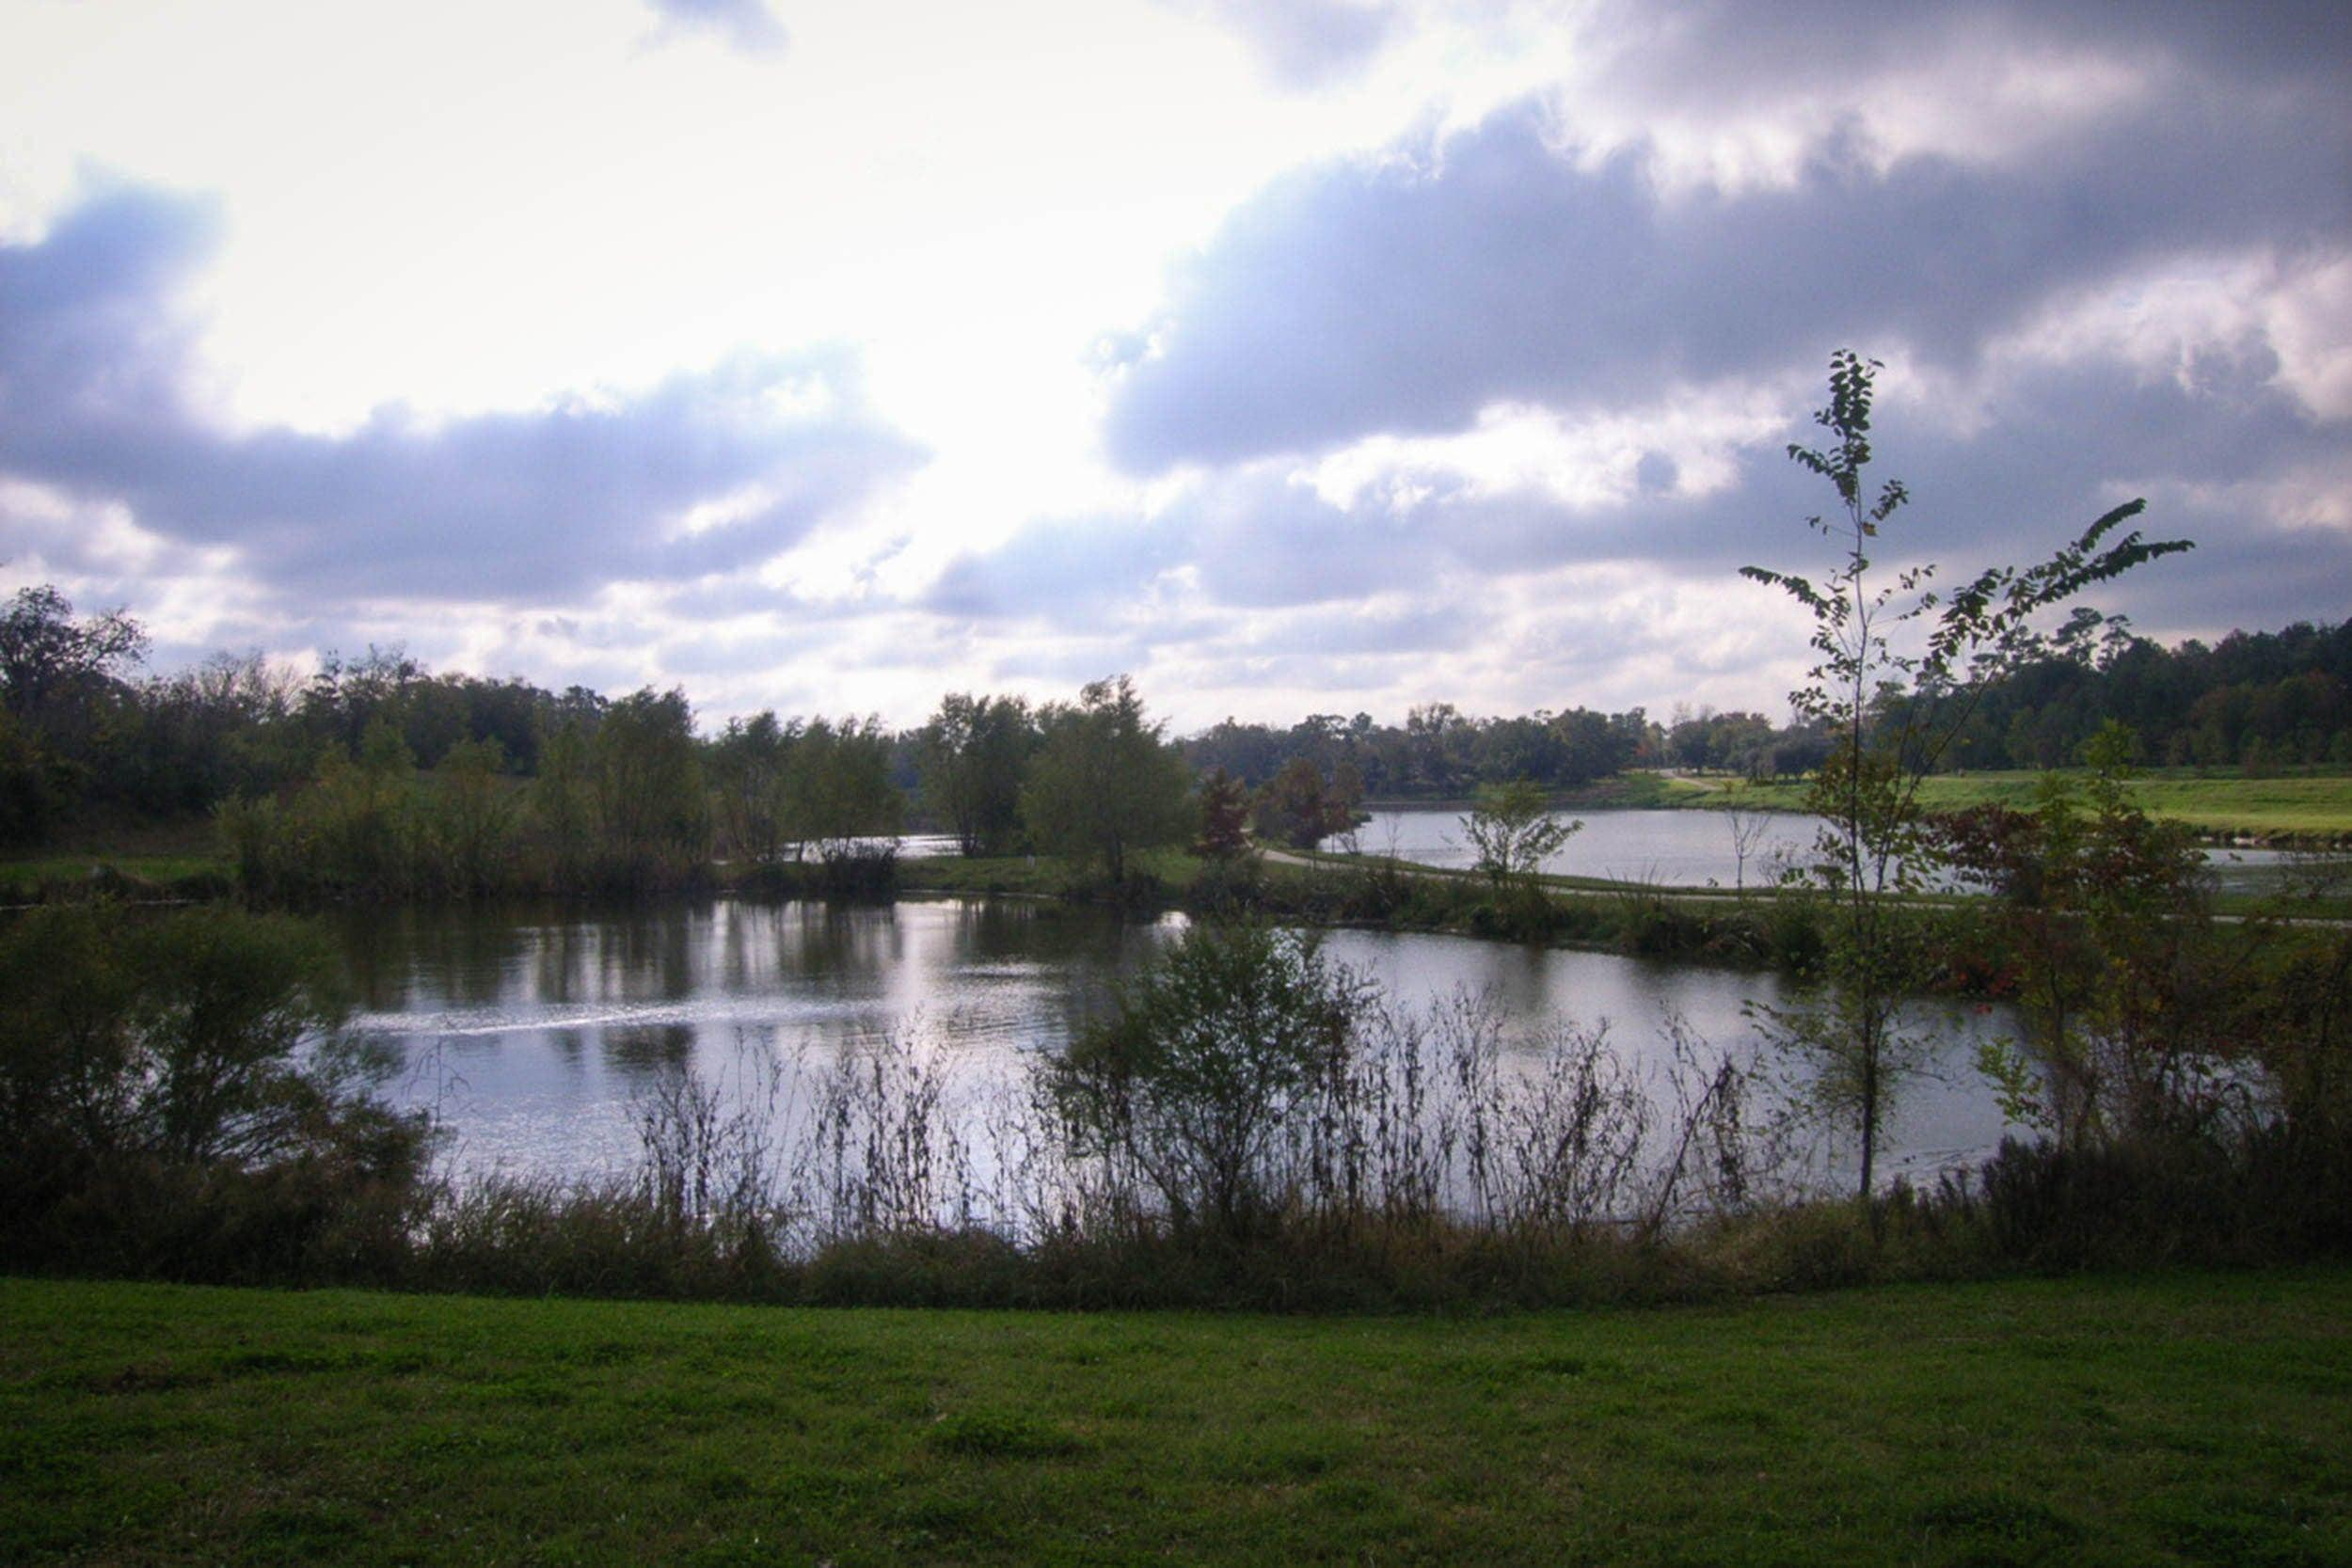 Ponds at Mason Park and Brays Bayou (right)